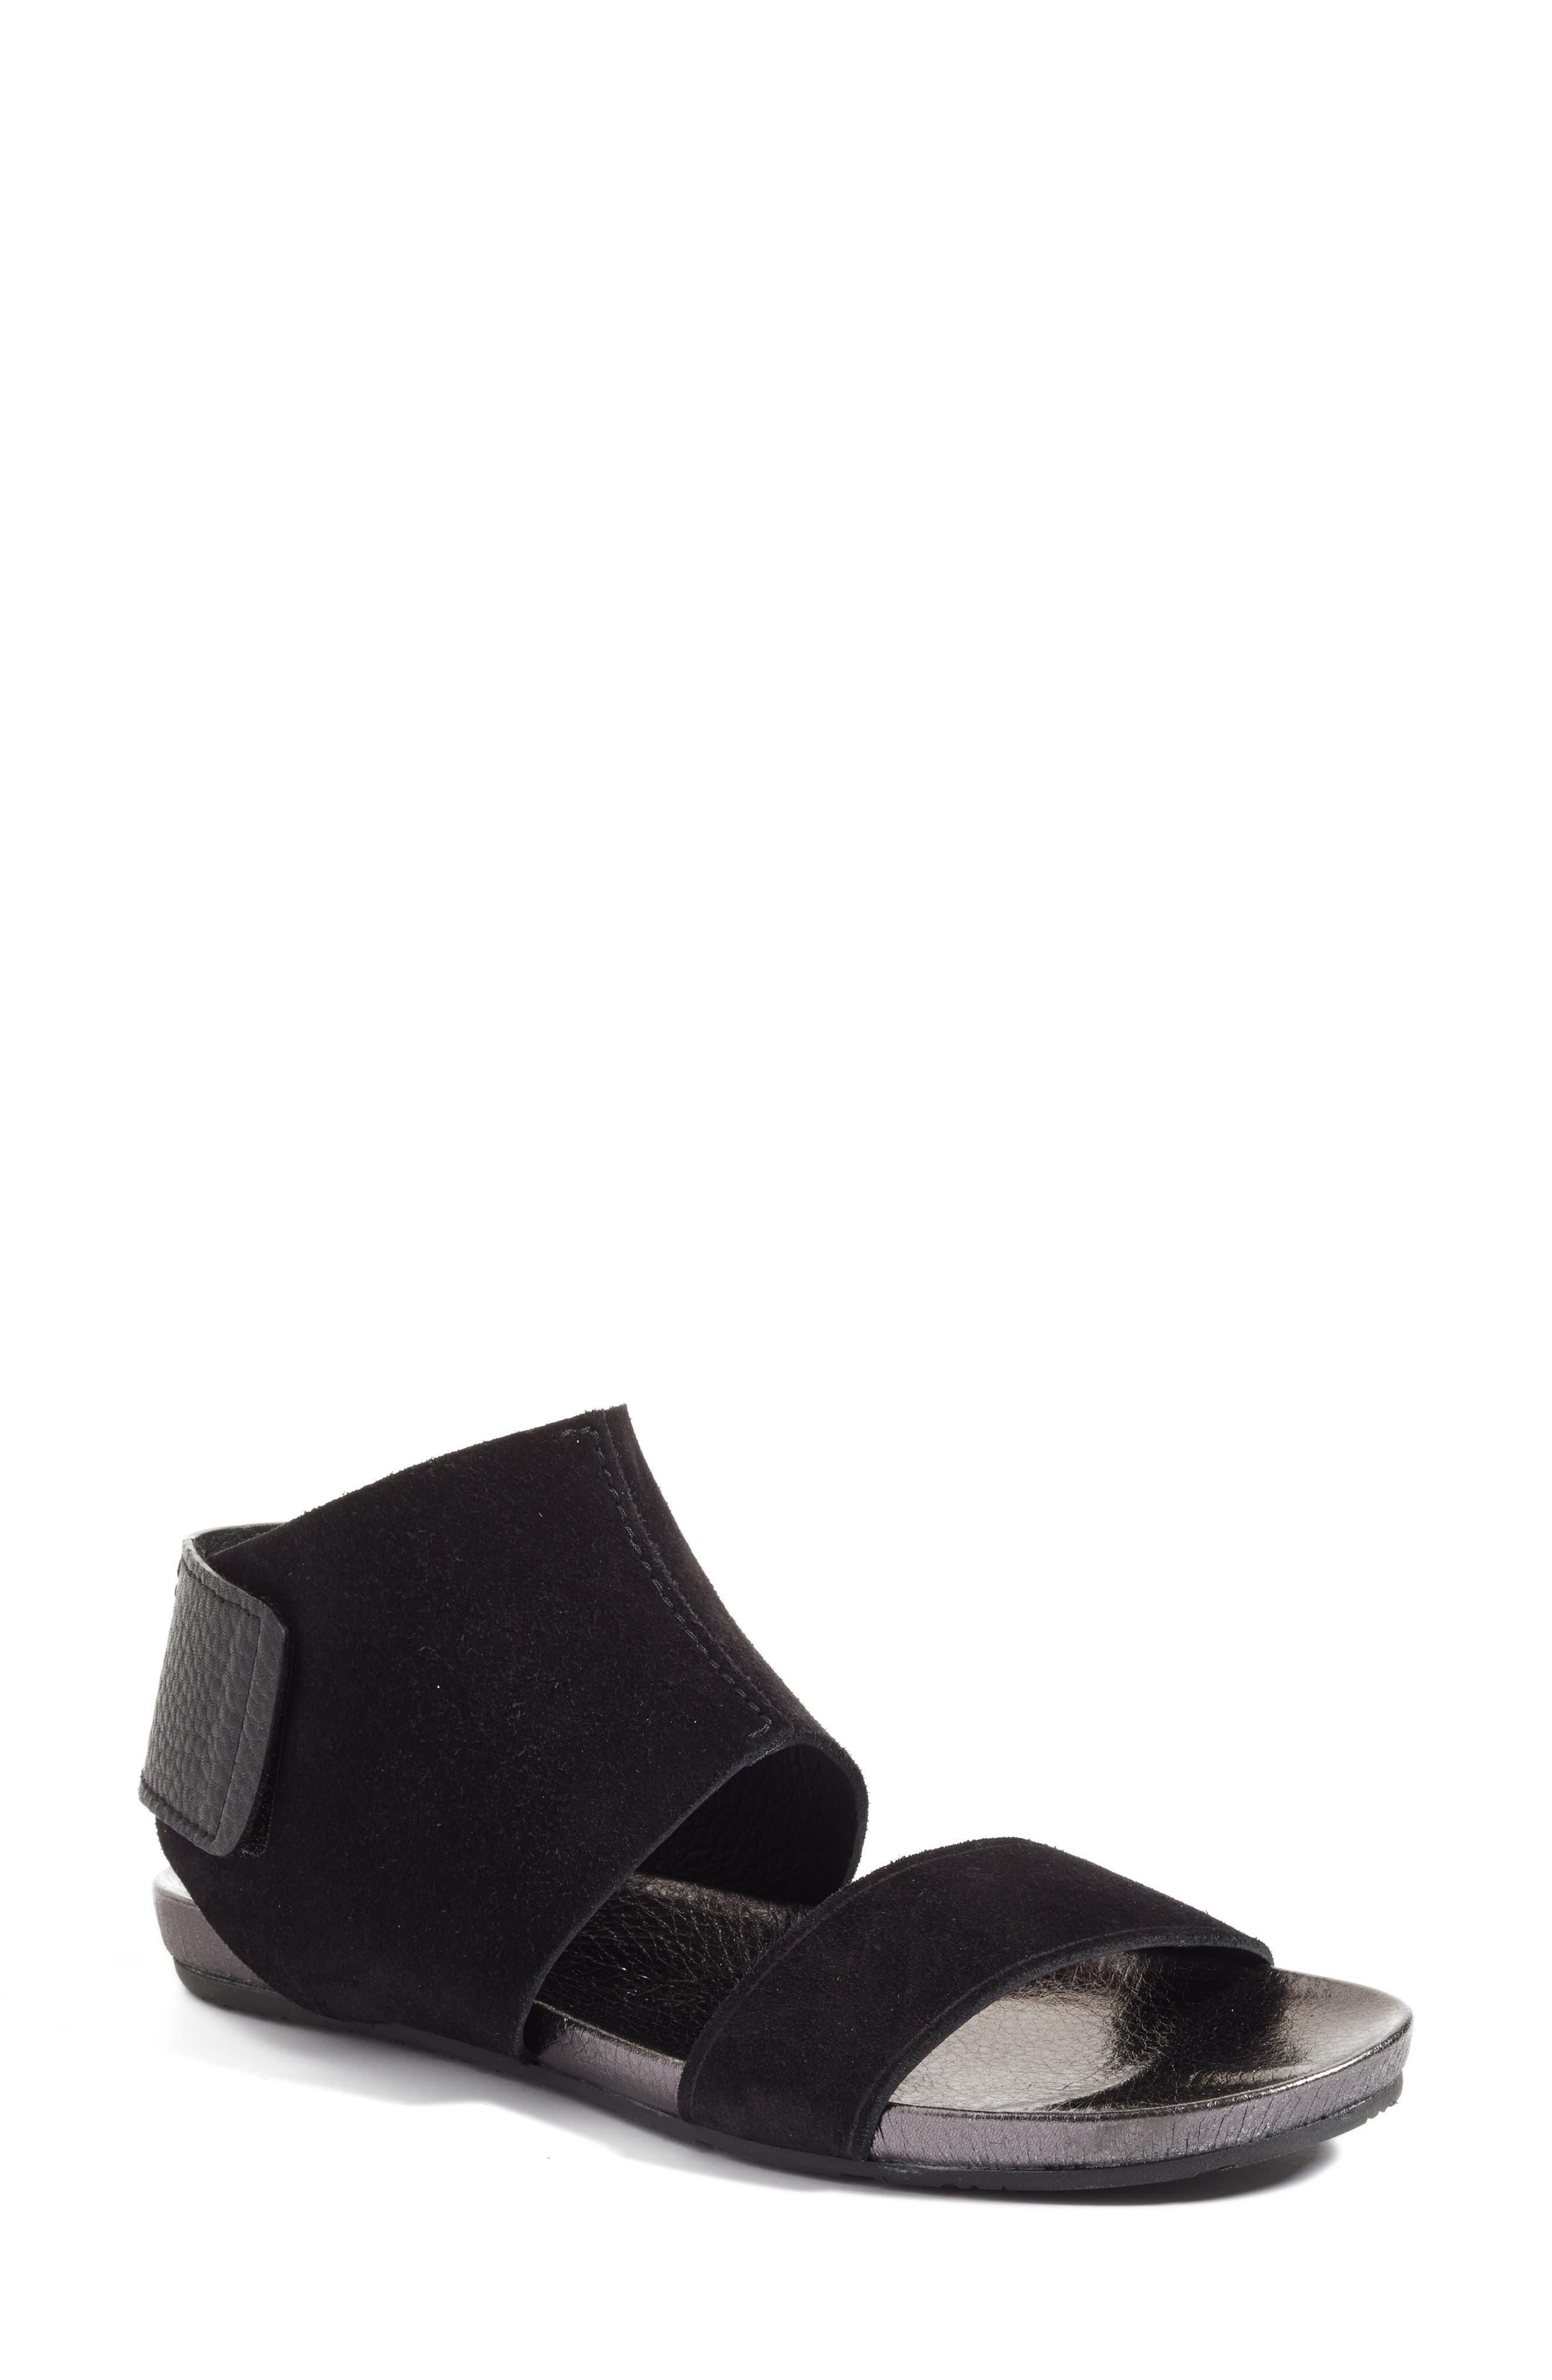 Ankle Cuff Sandal,                         Main,                         color, 001